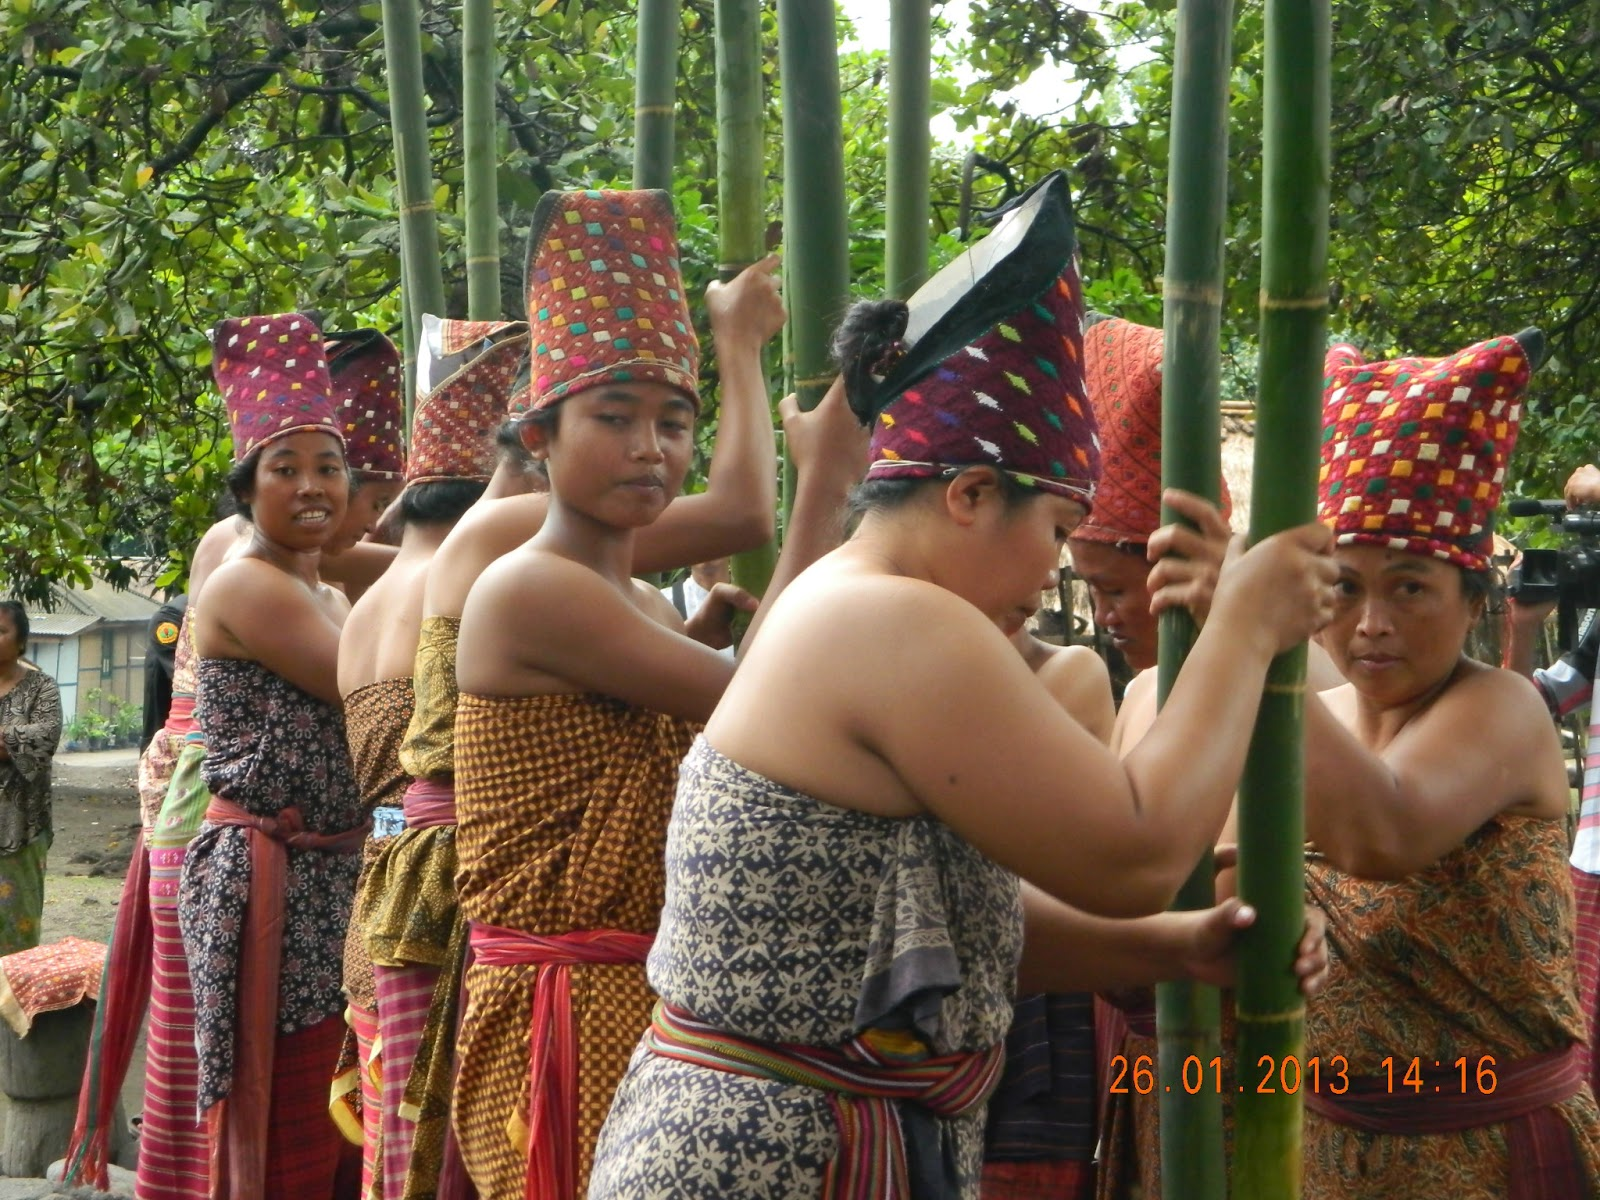 Prosesi Sejarah Maulid Adat Bayan Lombok Beleq Utara Masjid Kab